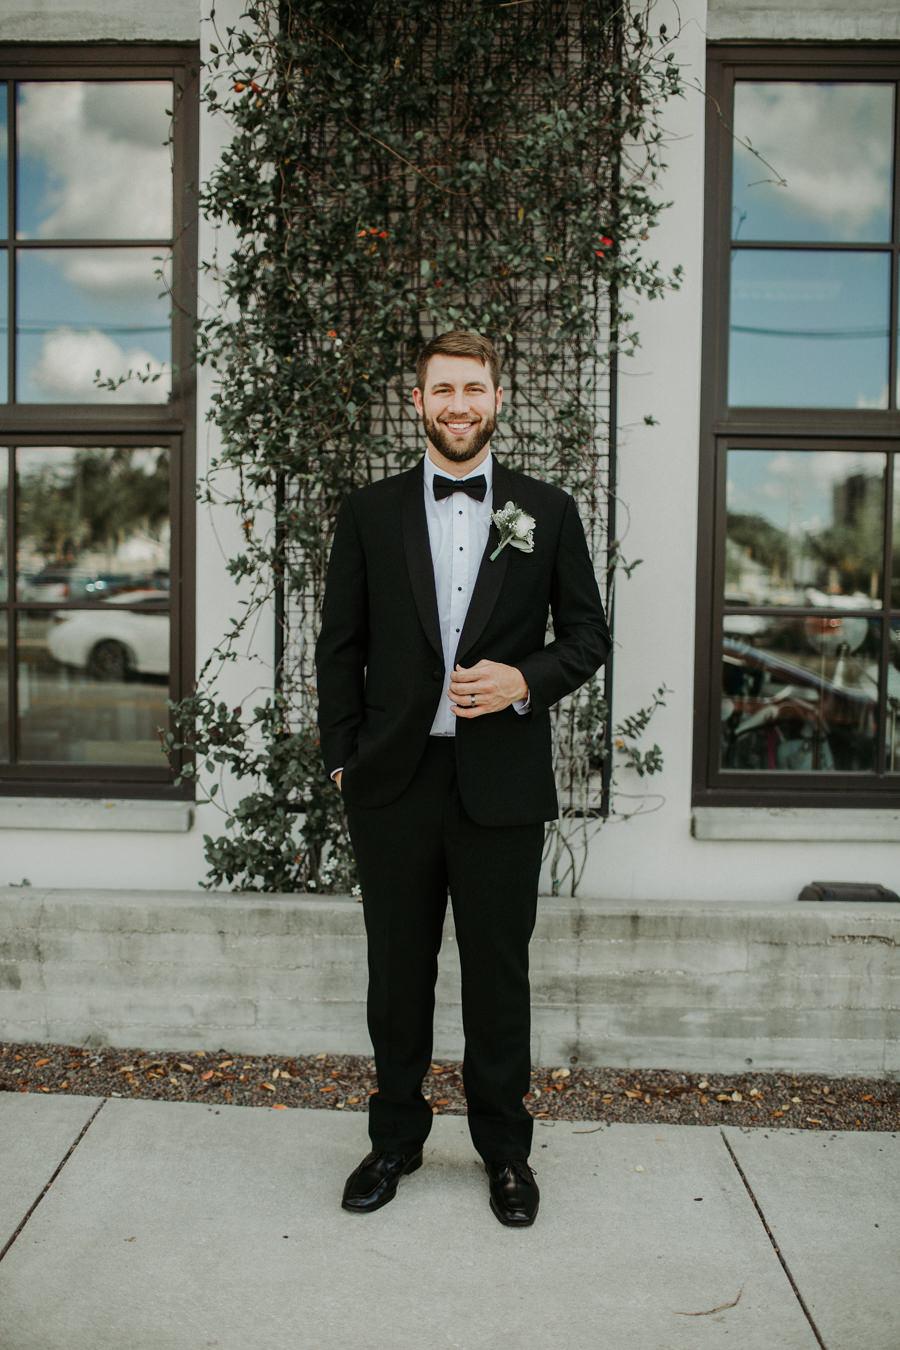 Tampa Heights Industrial Wedding at Cavu Emmy RJ-117.jpg